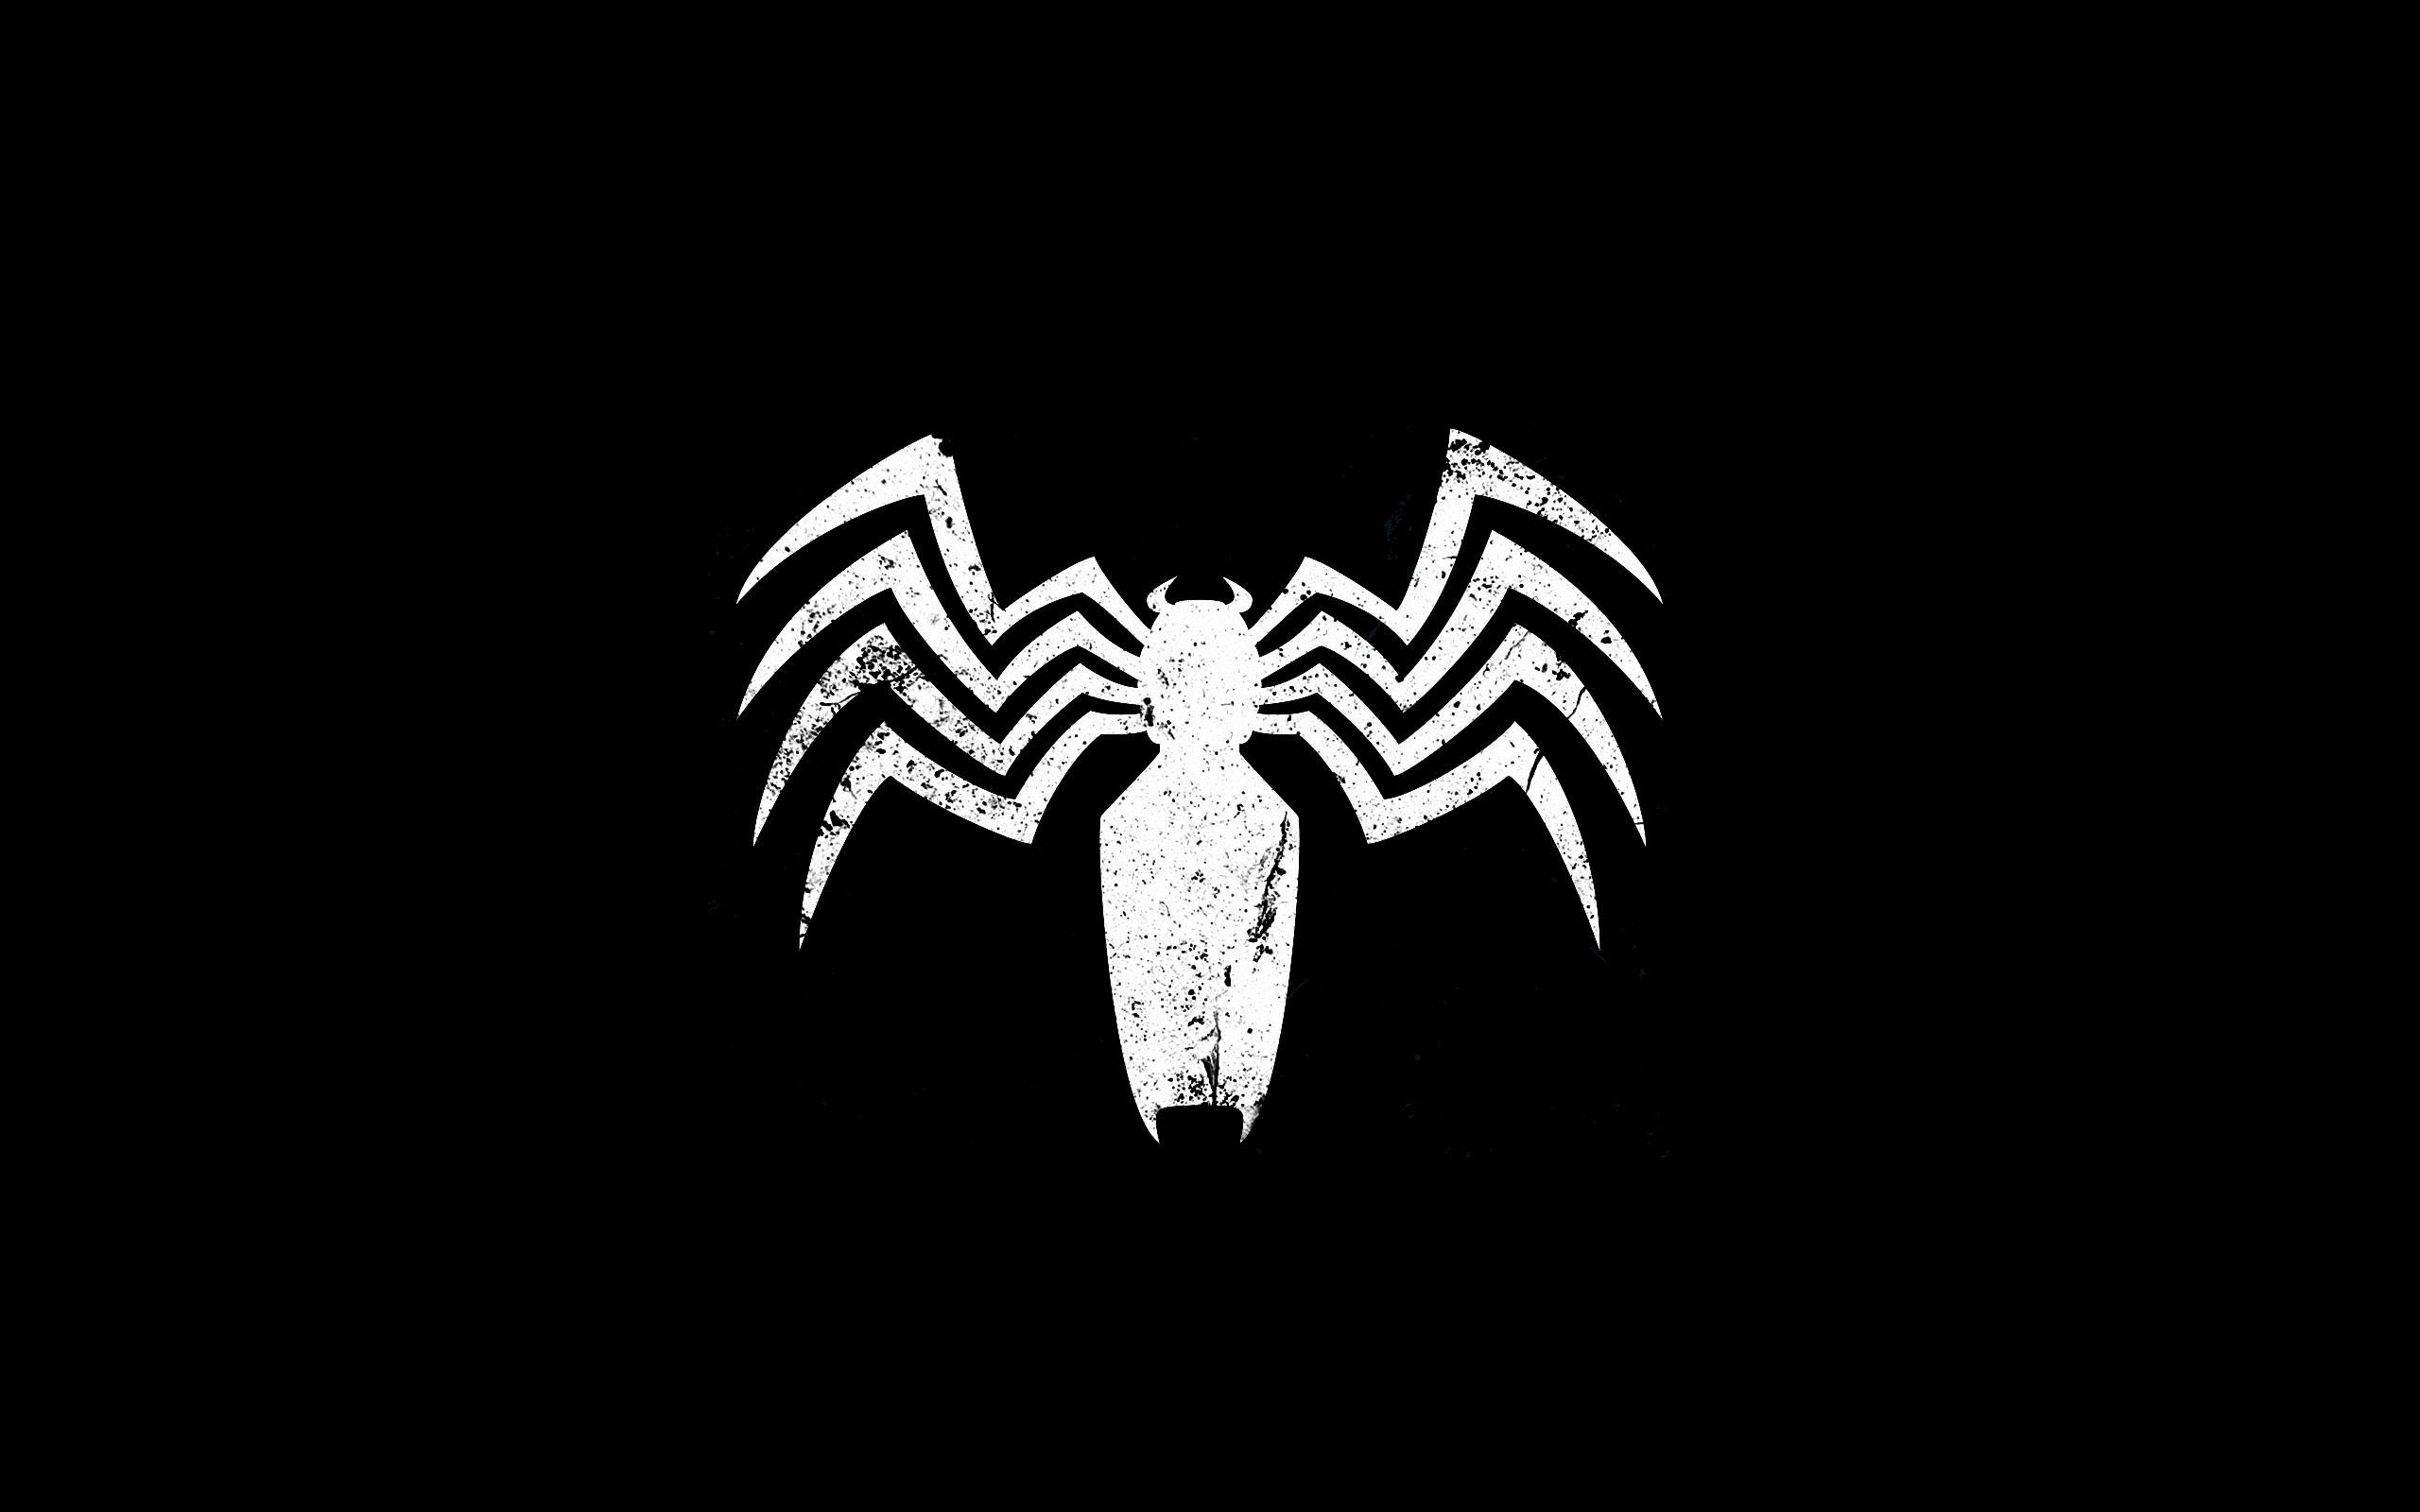 Black Spiderman Logo HD Wallpapers